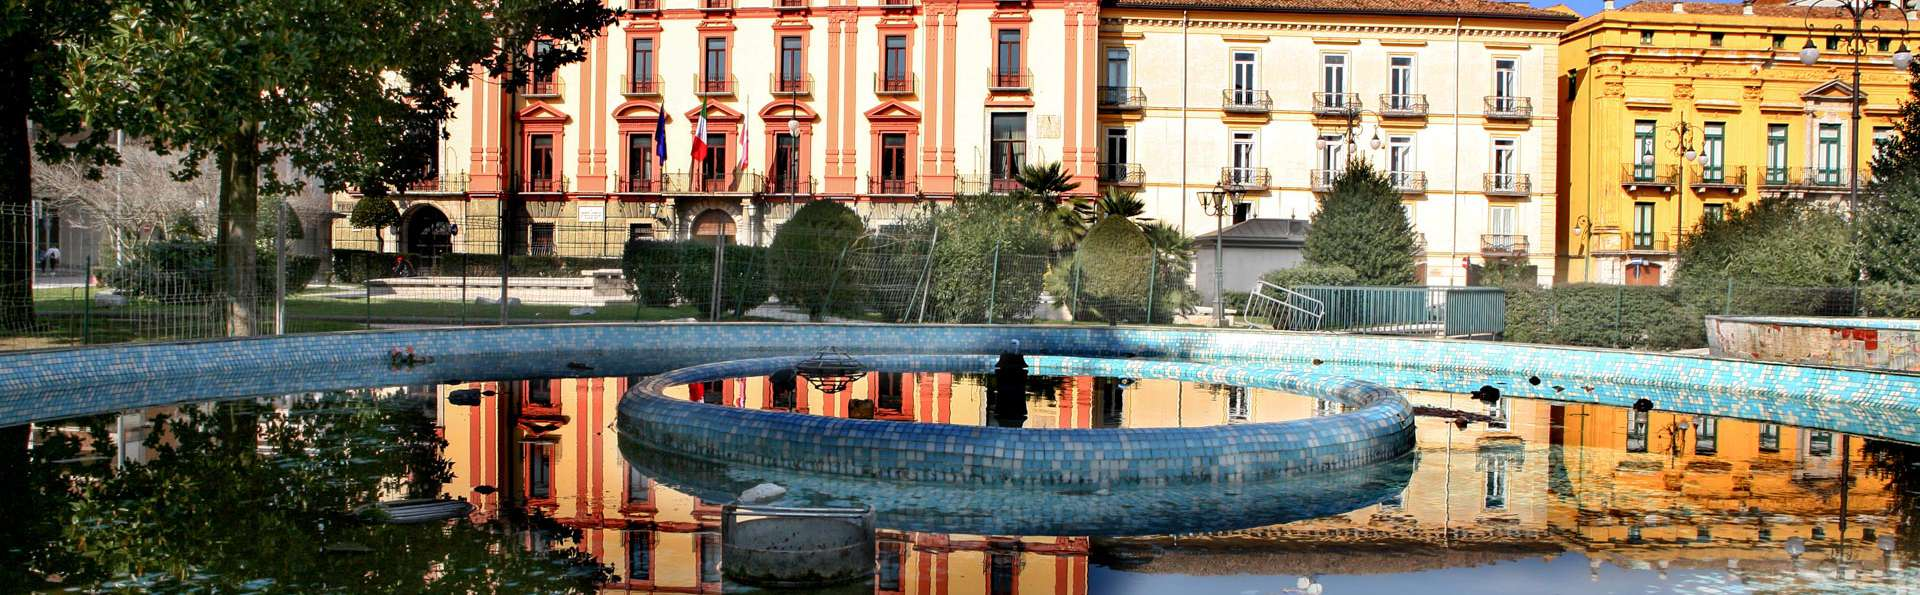 Royal Hotel Montevergine - EDIT_DESTINATION_01.jpg